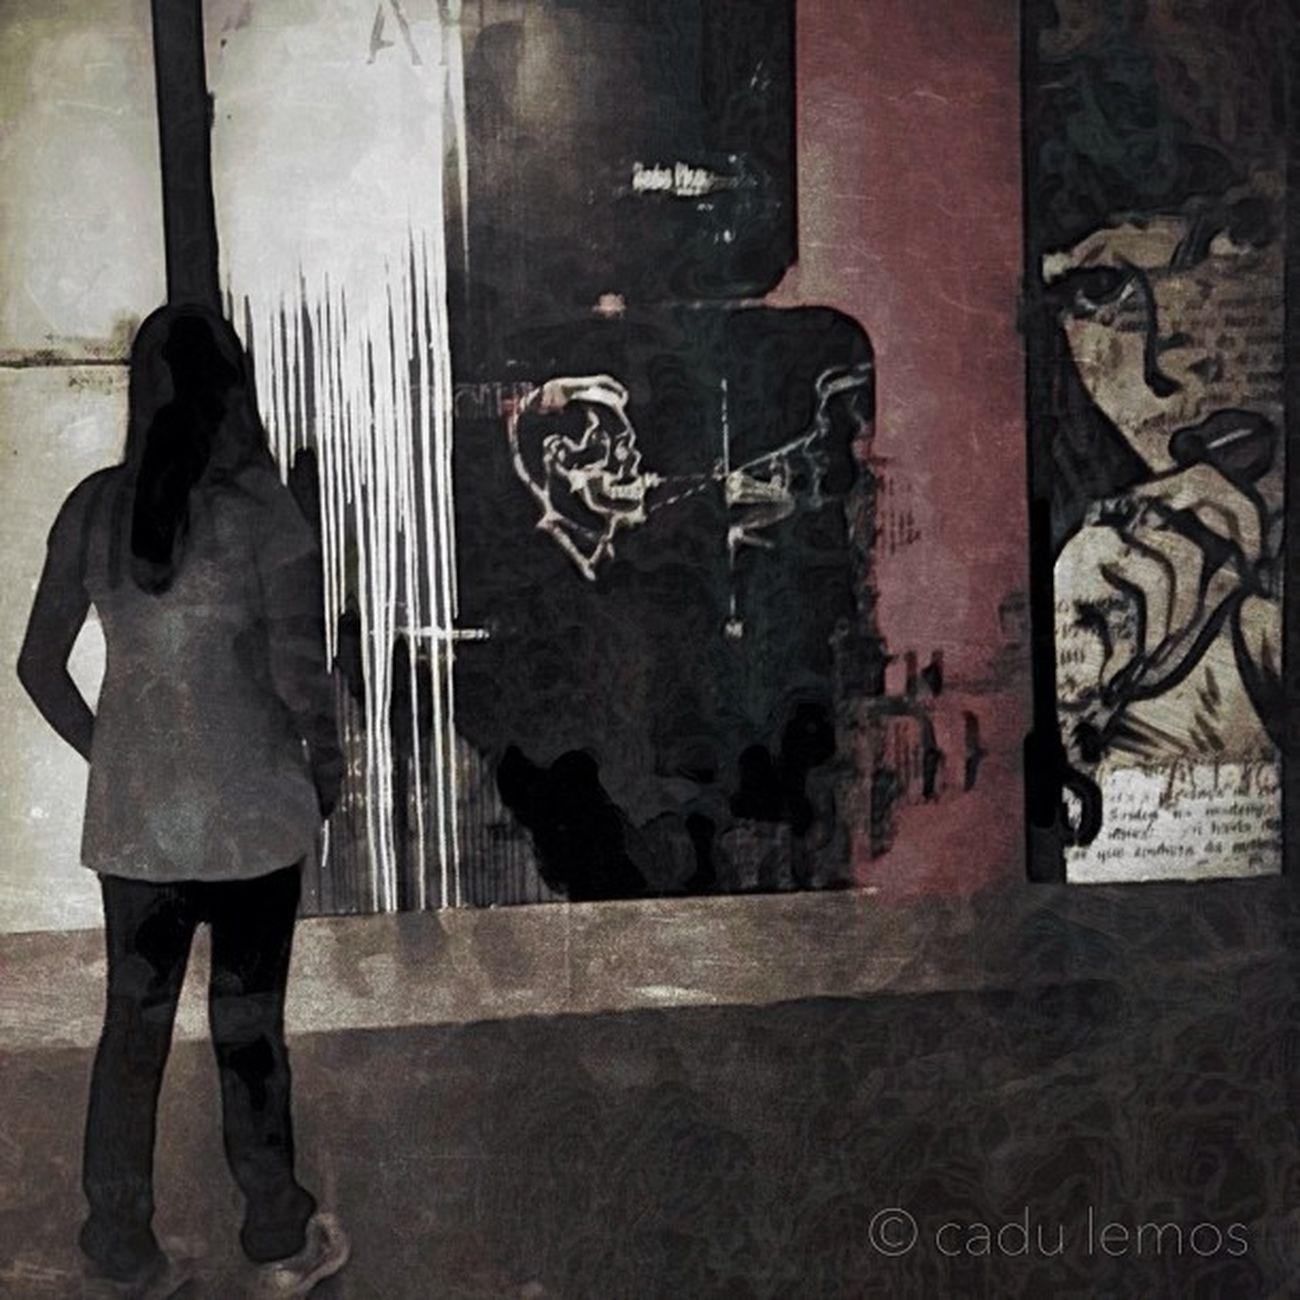 graffiti Ink361 Justnoir Noir Rebel_bnw Blackandwhite Fineart_photo Monochrome Publicimage Bw Fineart_photobw Monoart Instaphoto Shootermag Monochromeart Vscocam Igerstravel Fineart Bwlandscape Justgoshoot Monoart_ampt Blancinegre Bw_shotz Bws_worldwide Igsomniacs Pretoebranco Bnw_life Instafocus Amselcom